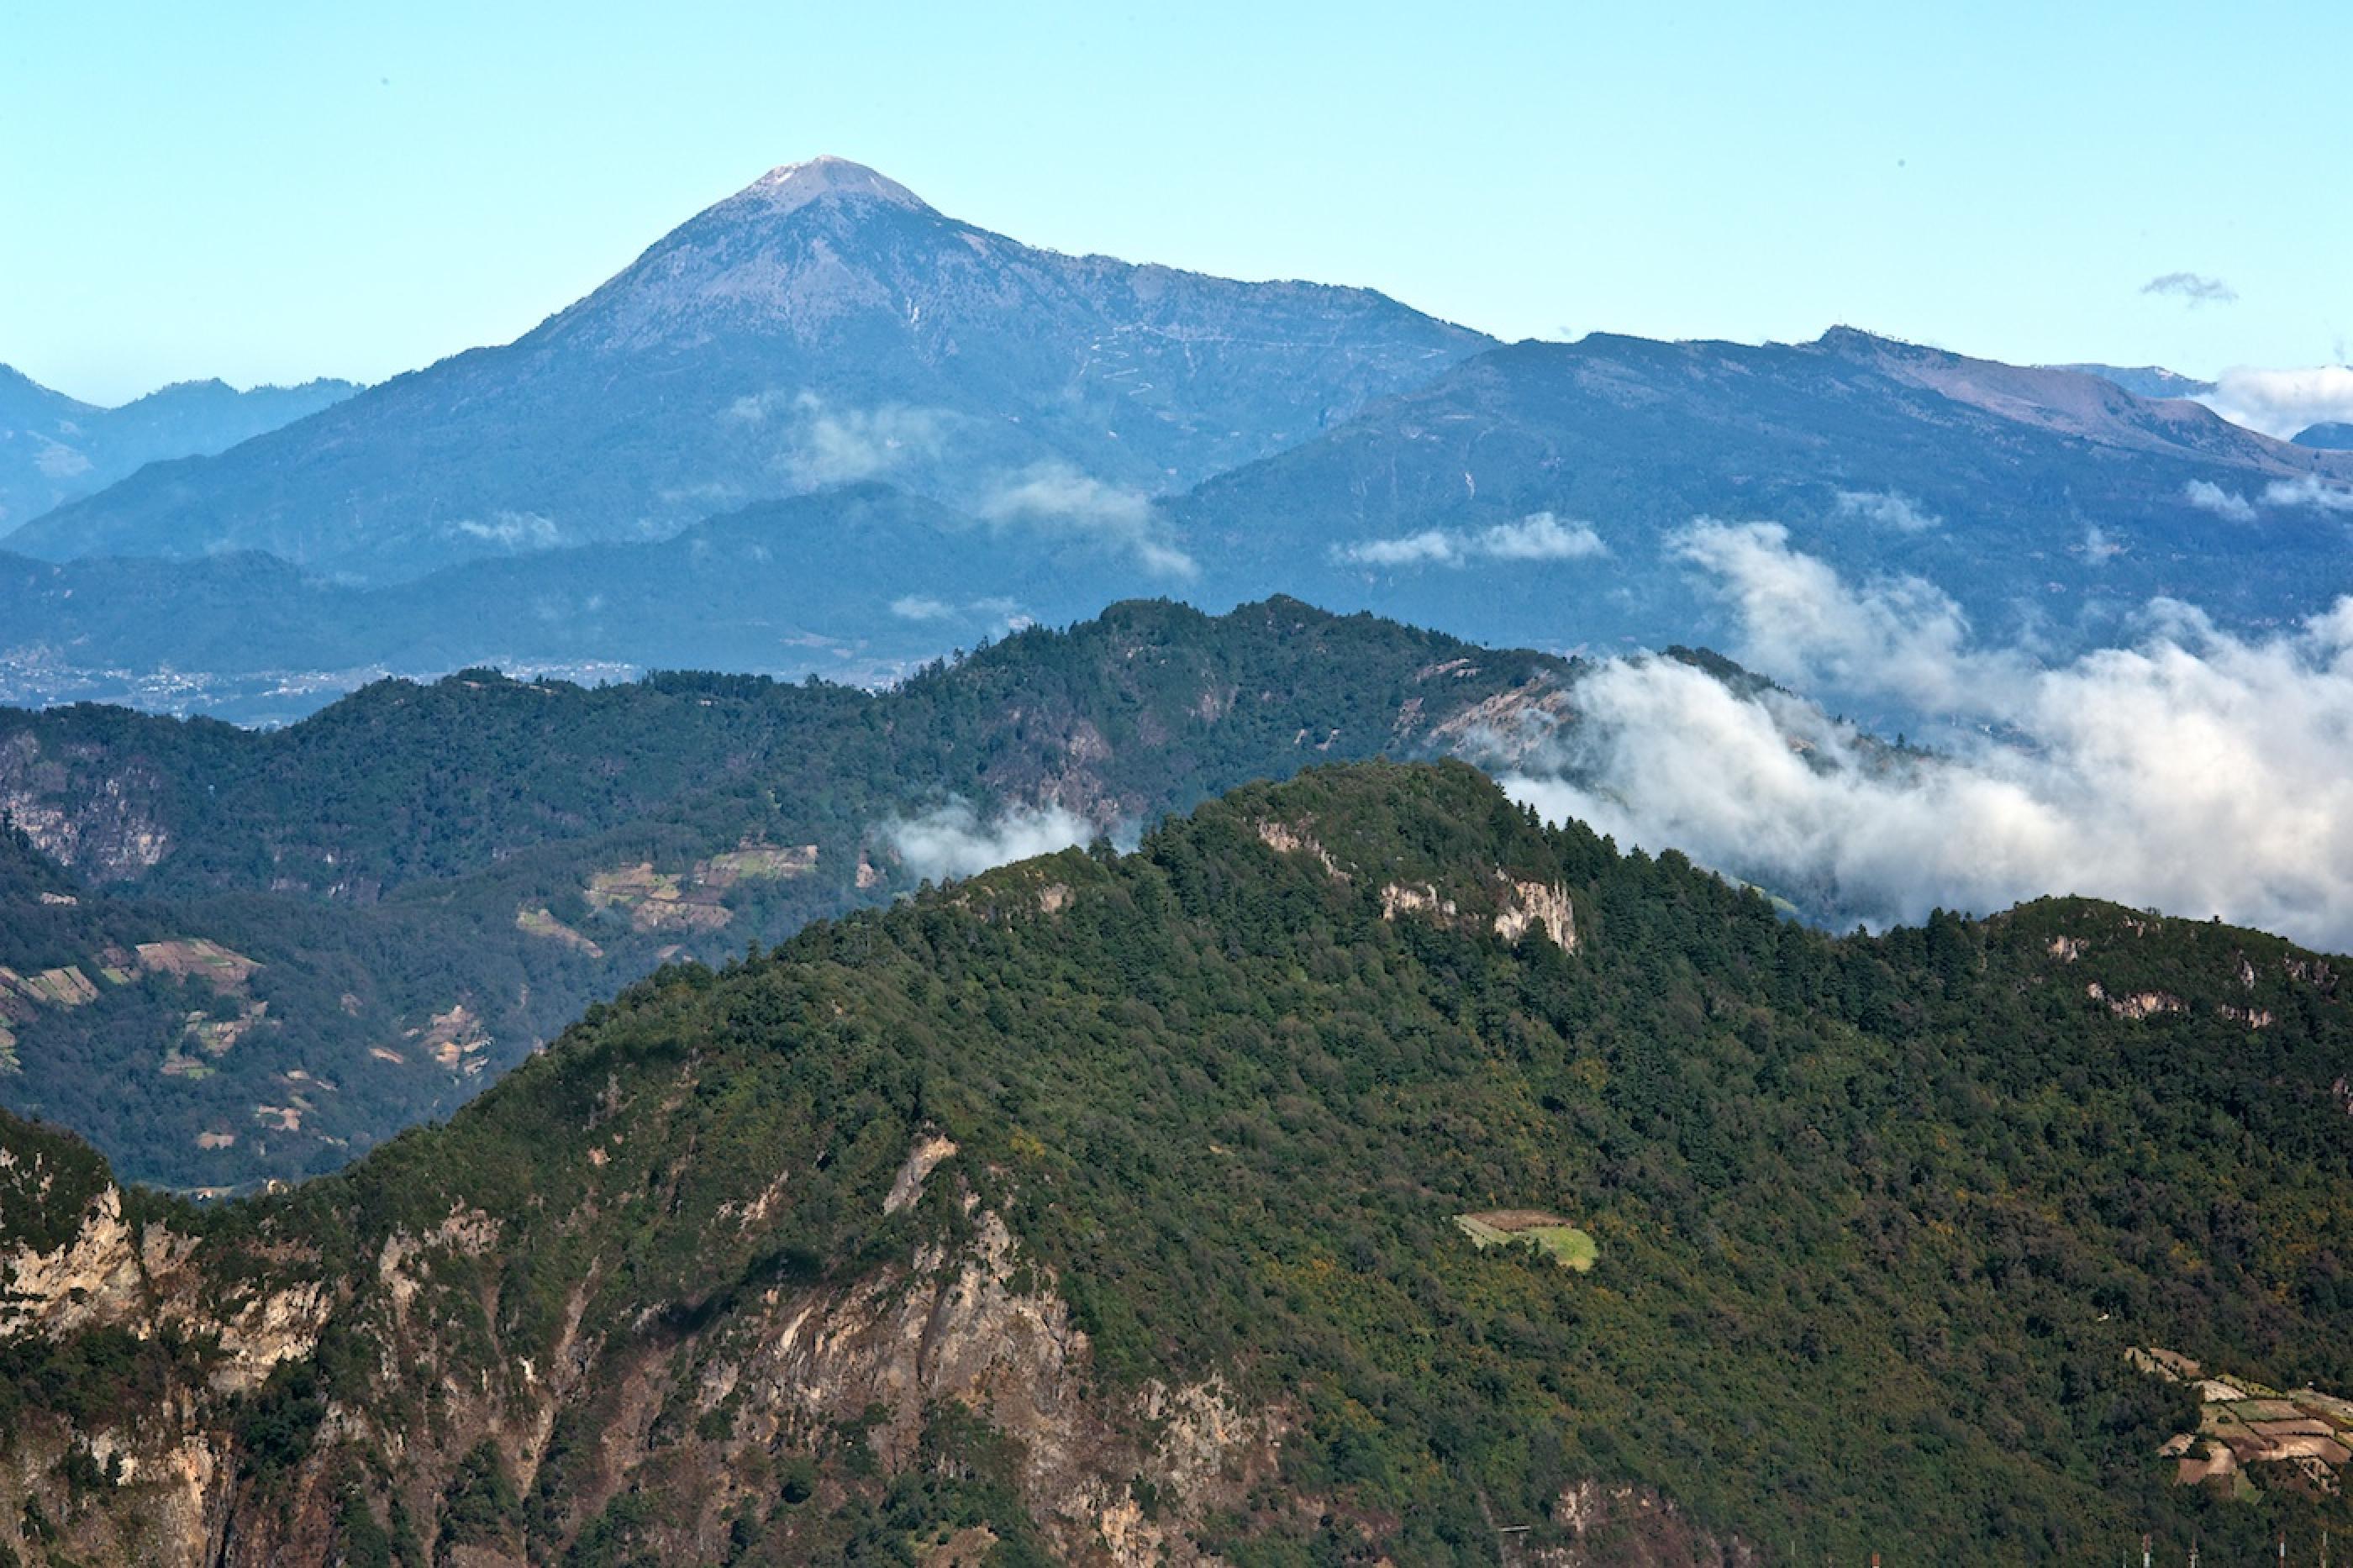 Caminata al Volcán Tajumulco